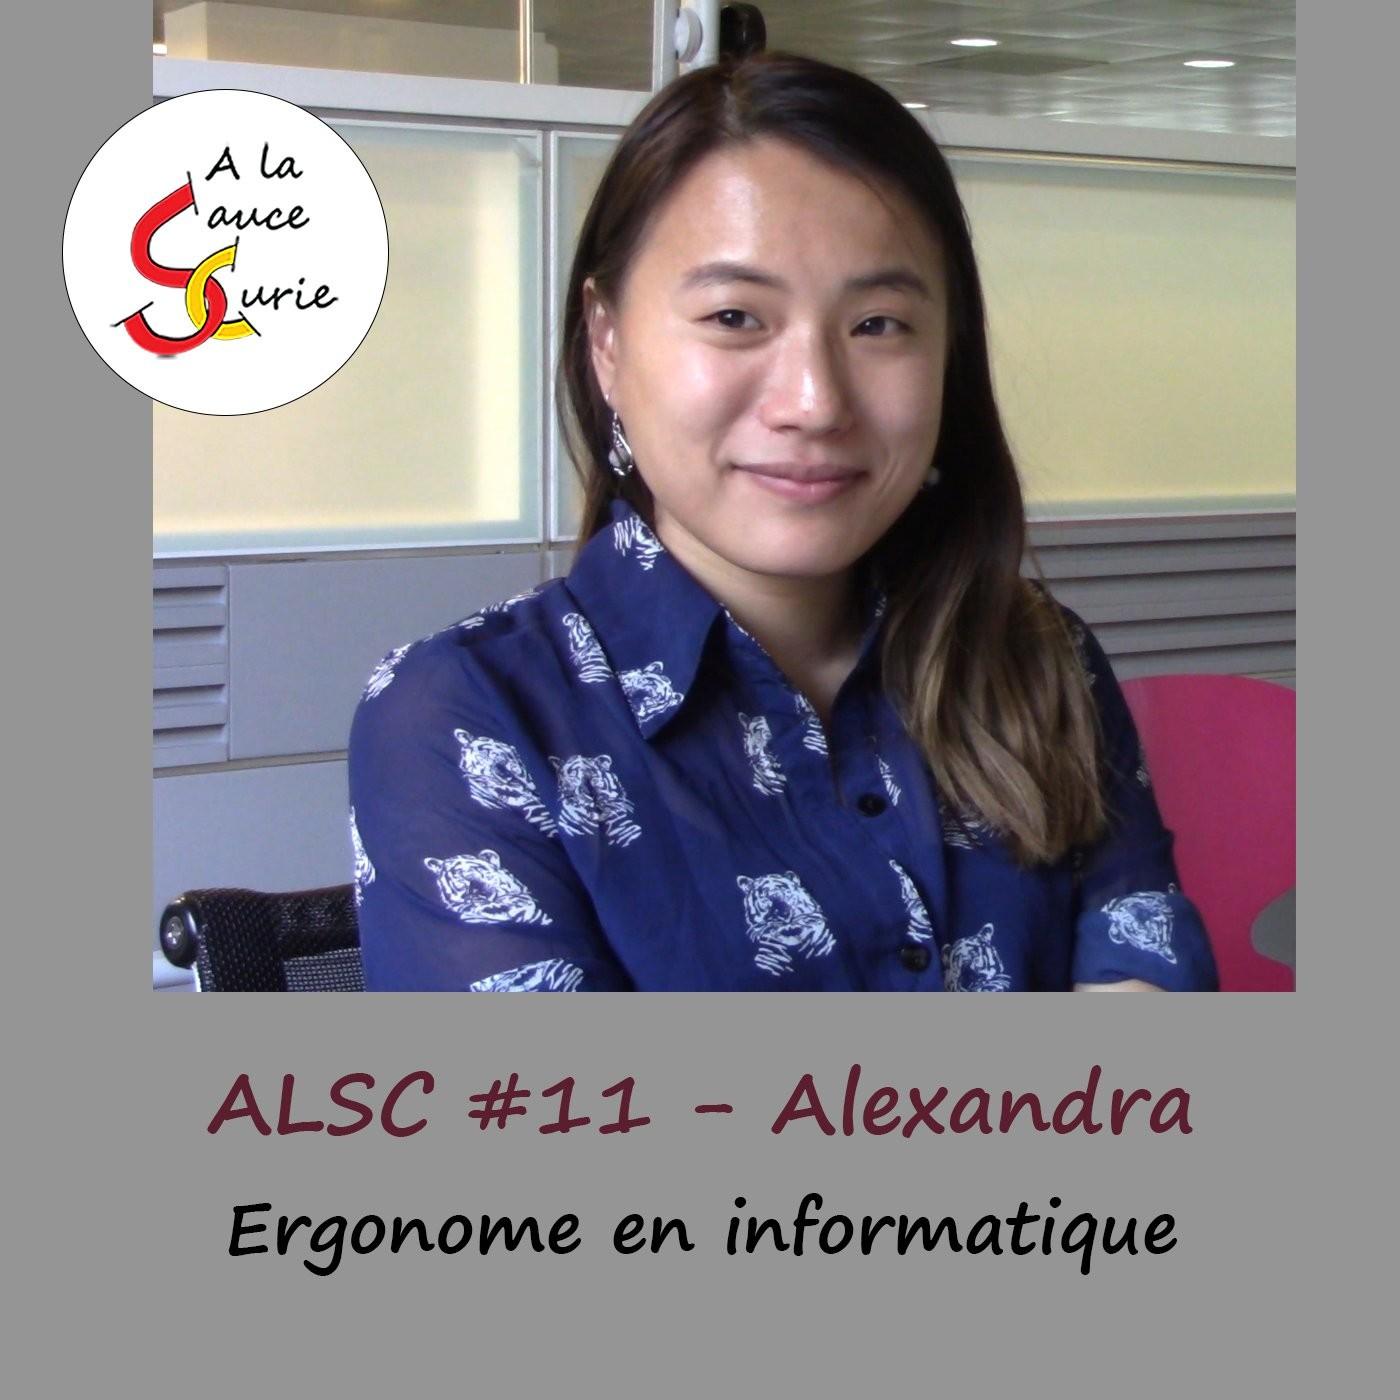 Alexandra, Ergonome en informatique [ALSC S01E10]